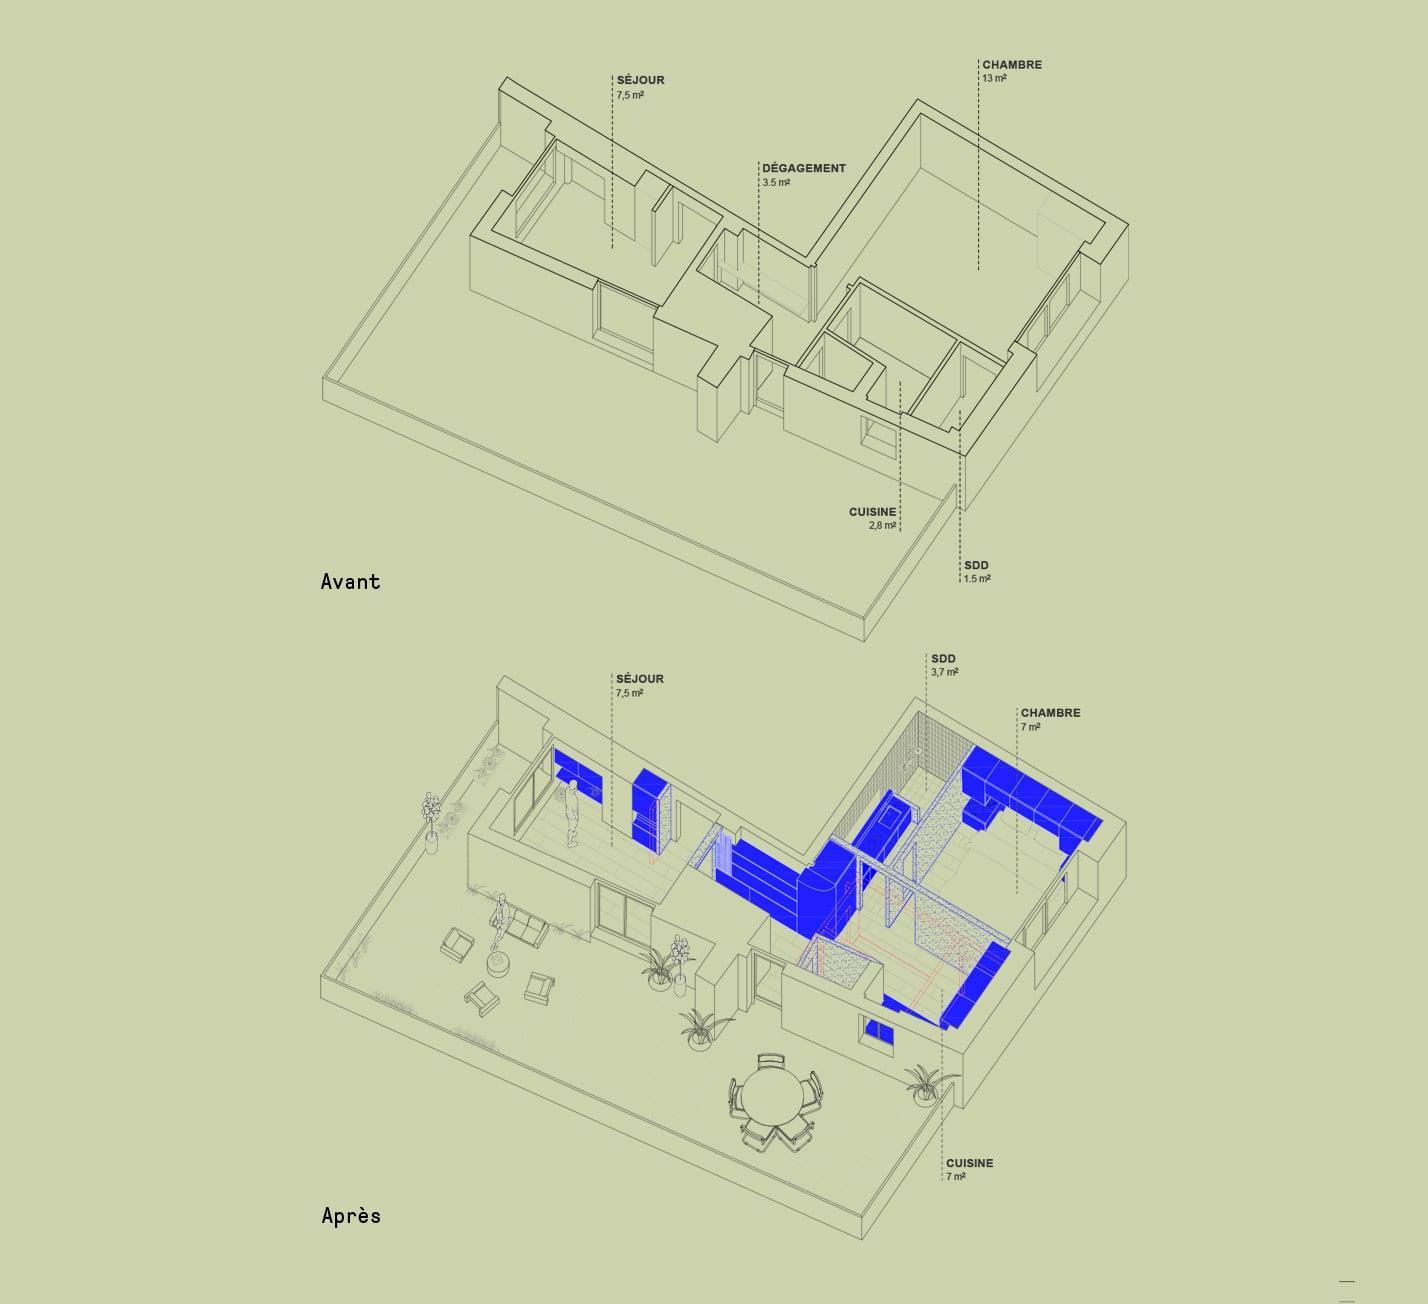 Appartement-Gabriel-Psd-dessins-02-min